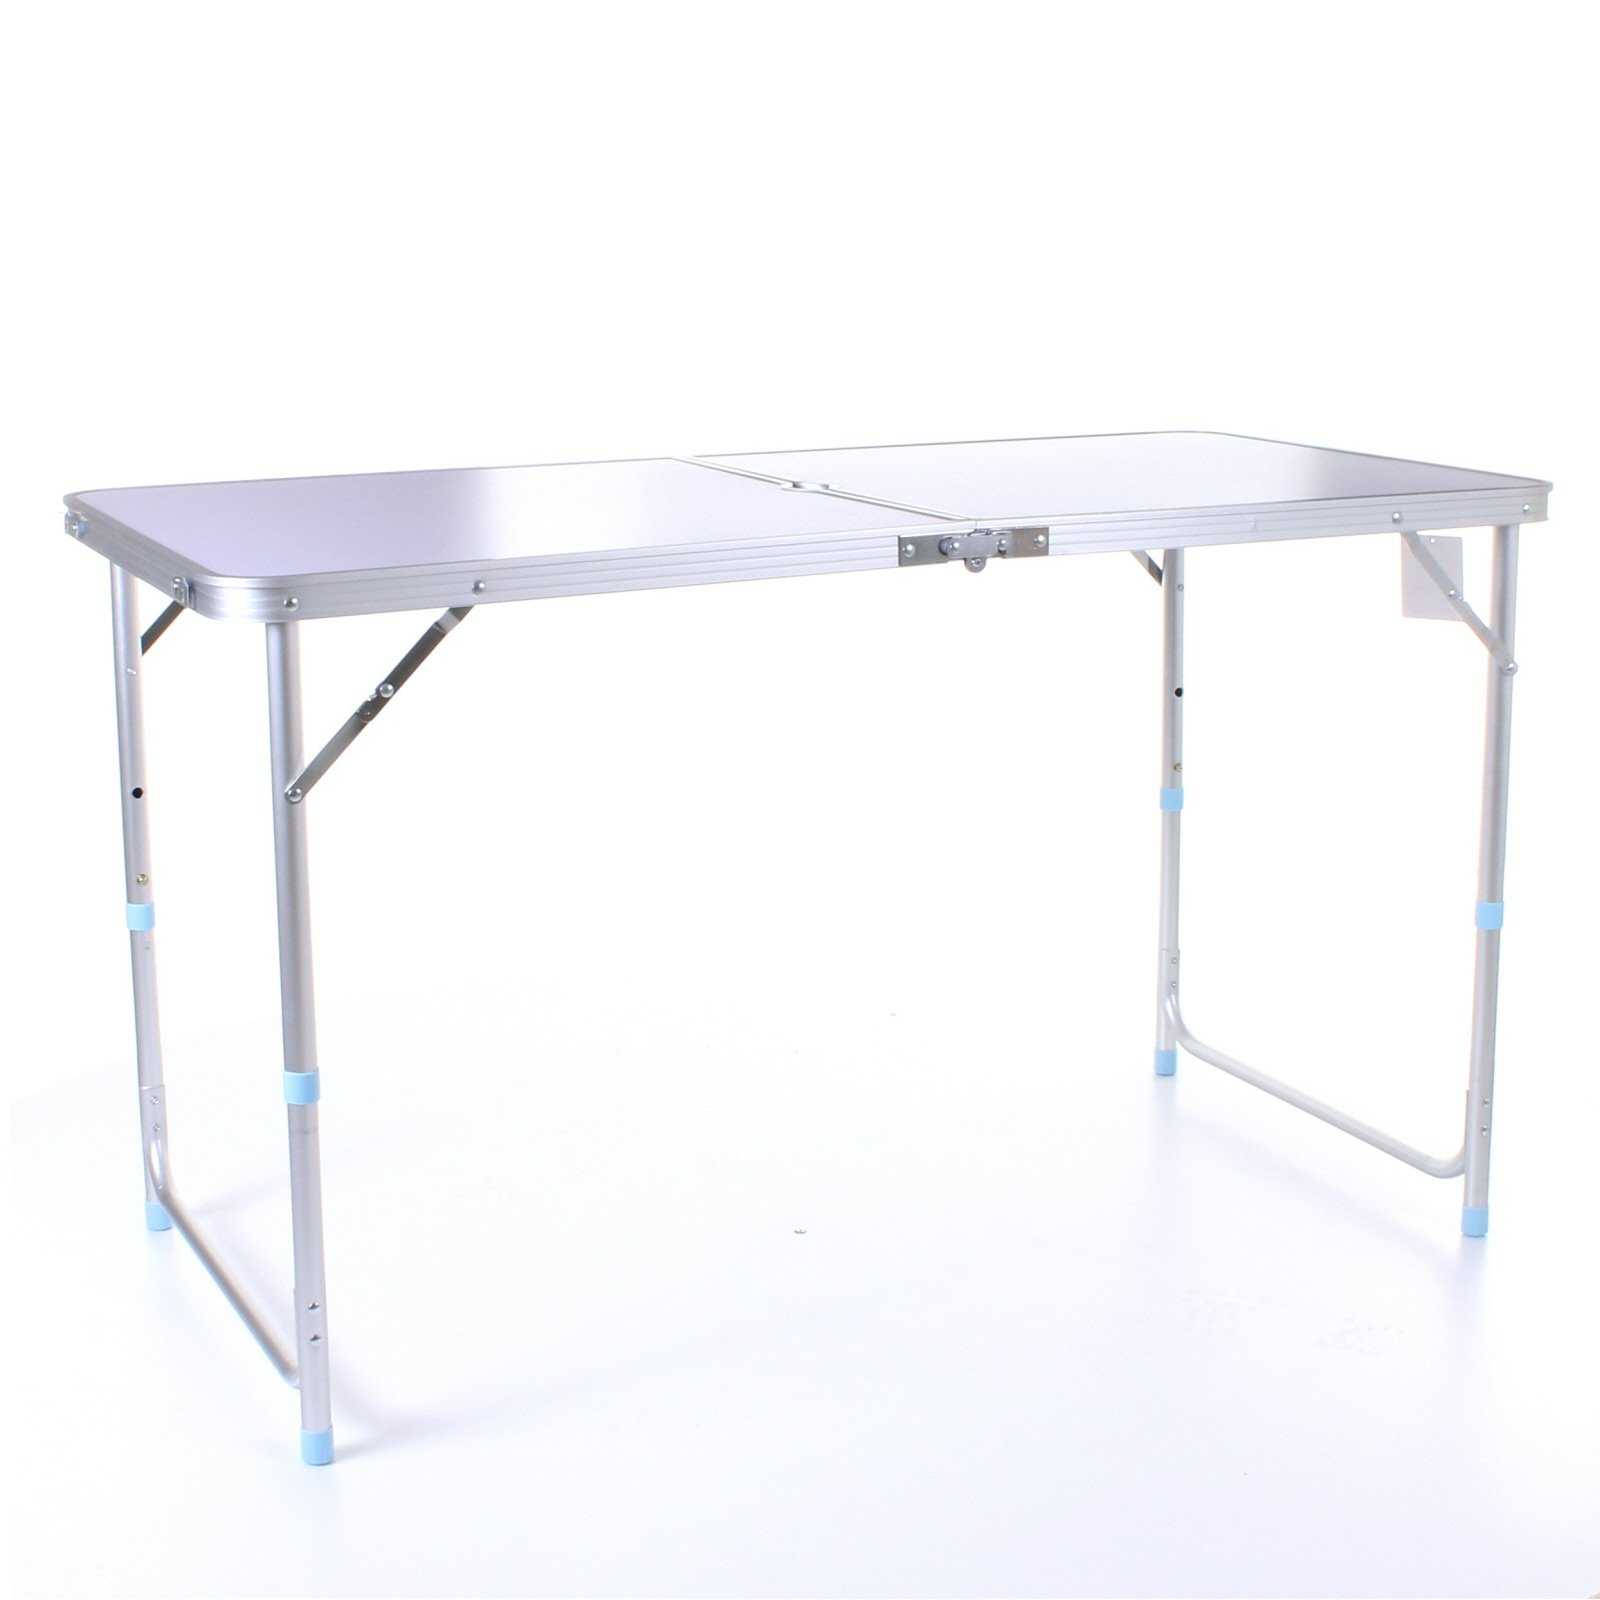 4FT Adjustable Aluminium Folding Portable Camping Table Party BBQ Parasol Hole